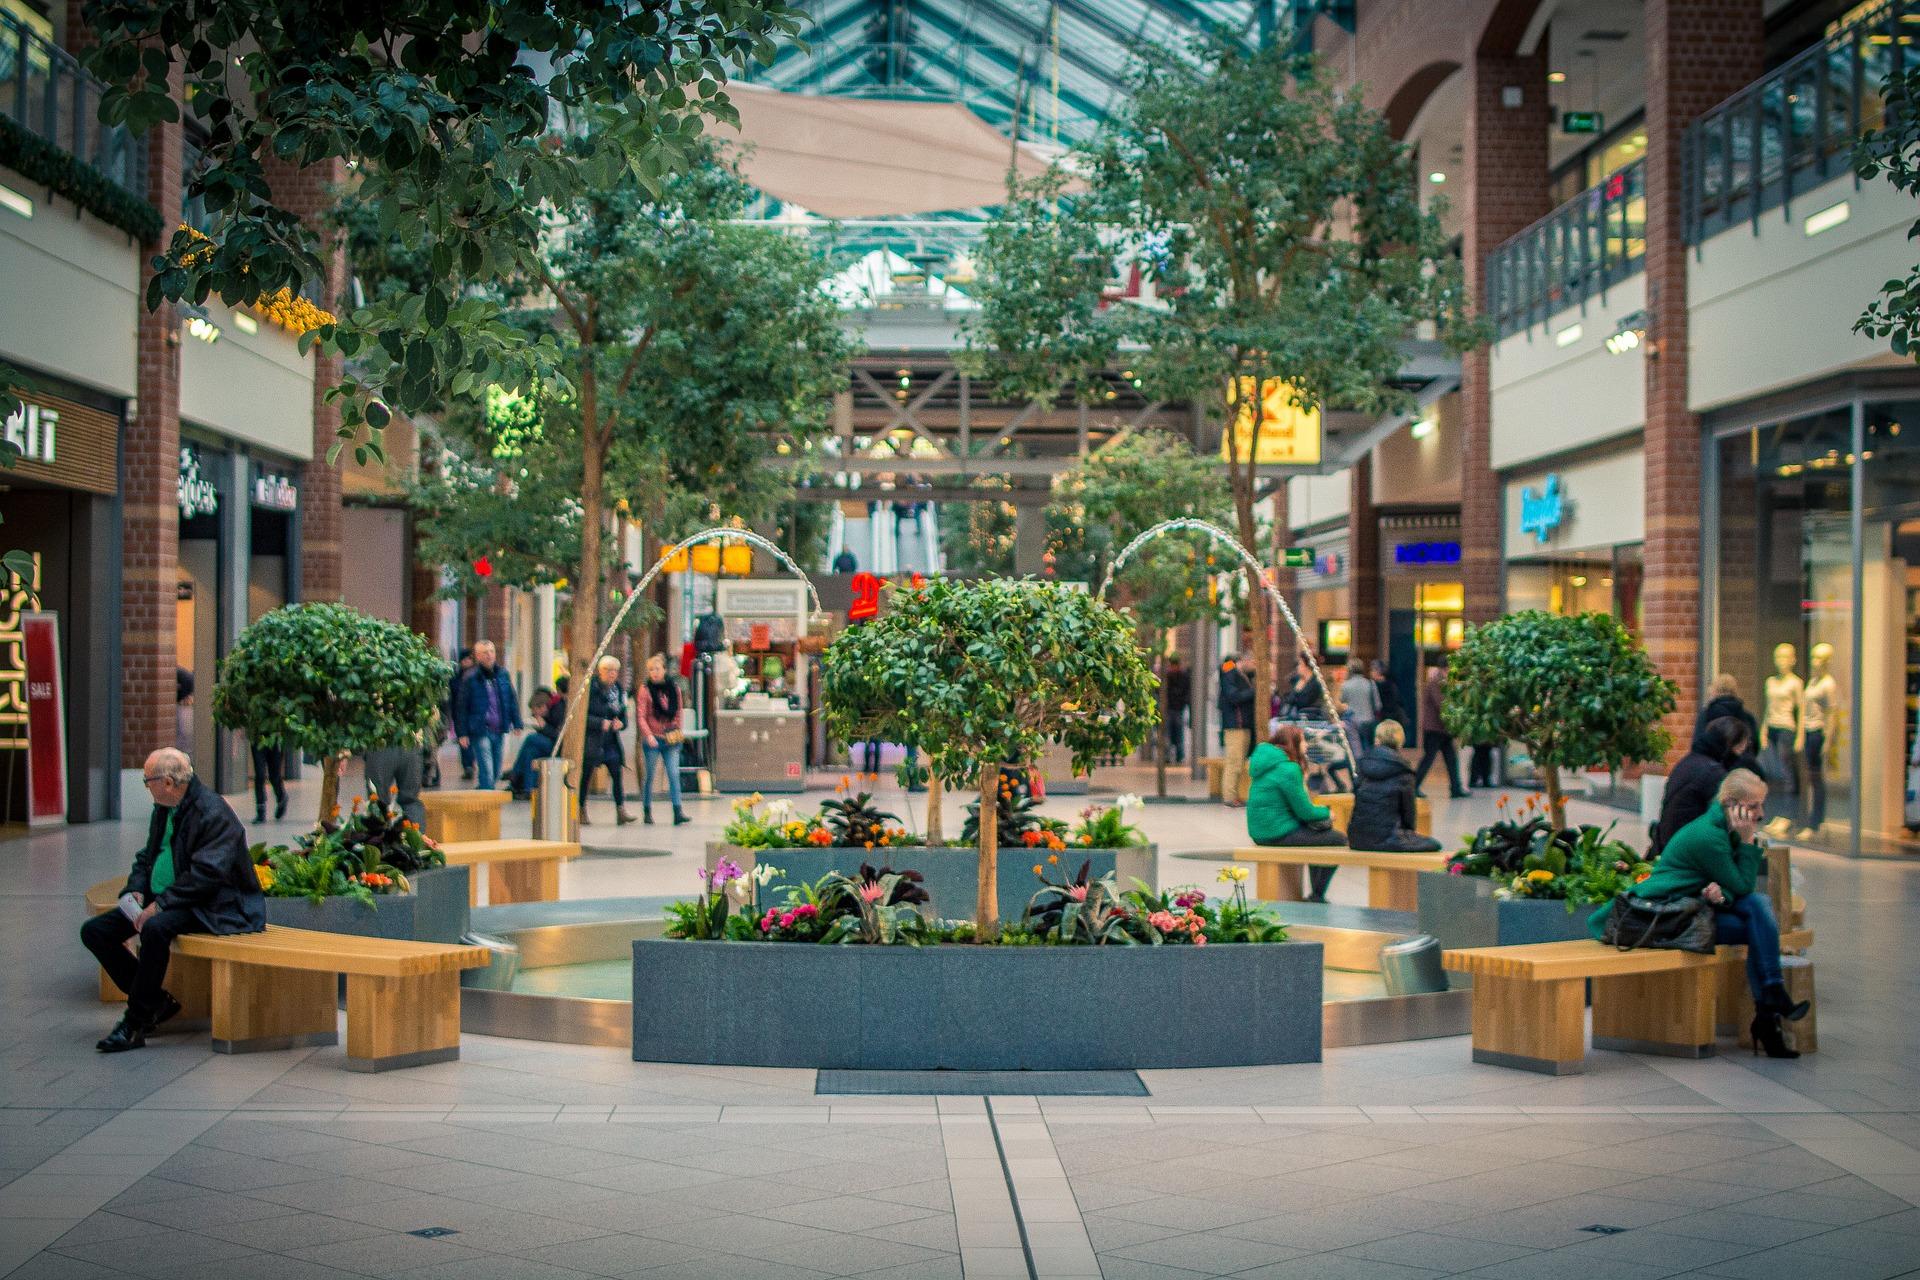 shopping-mall-1126485_1920.jpg